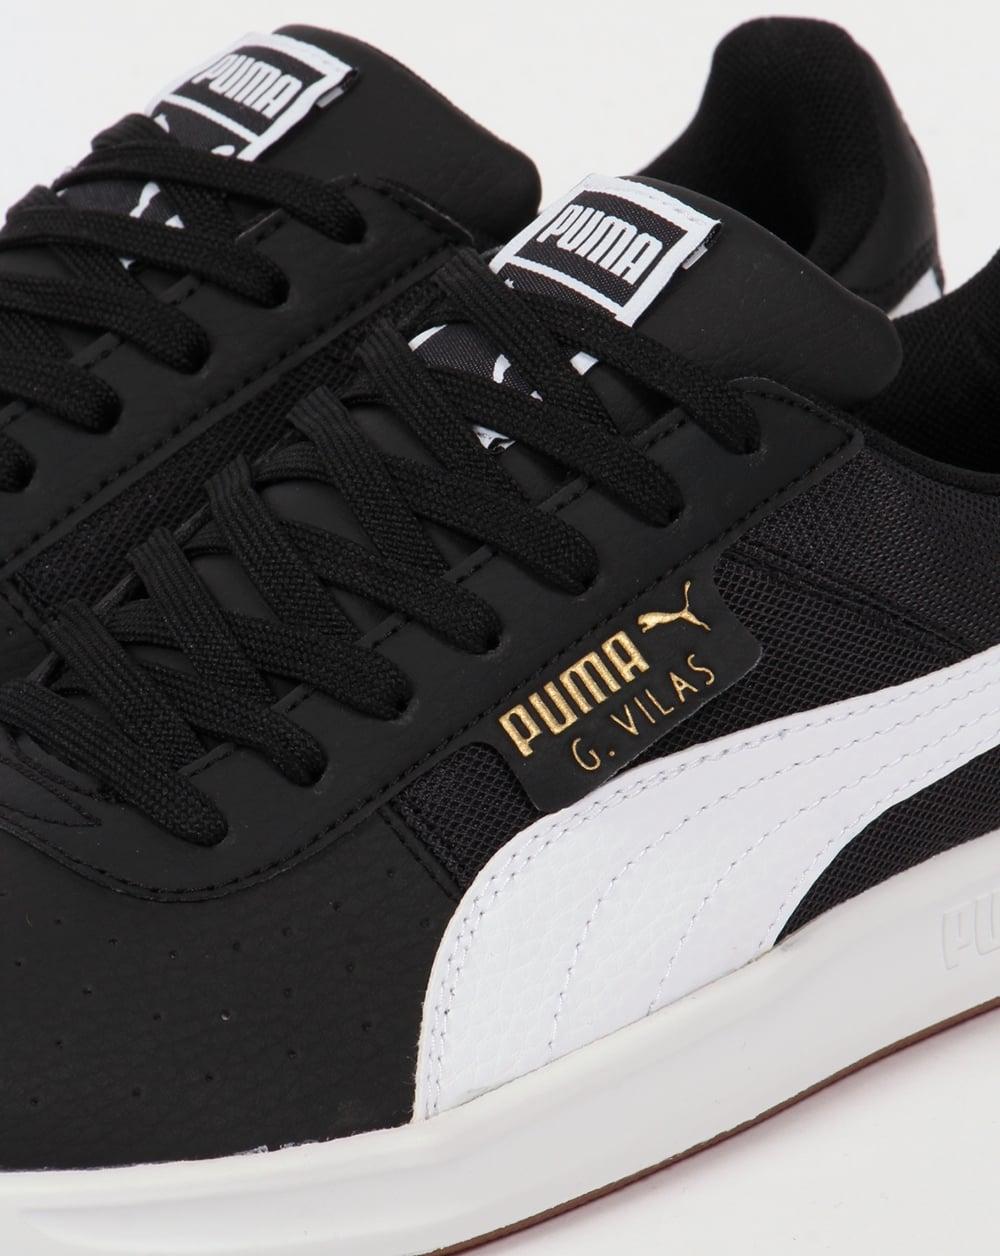 new style 3e81e af125 puma g vilas 2 black on sale   OFF31% Discounts